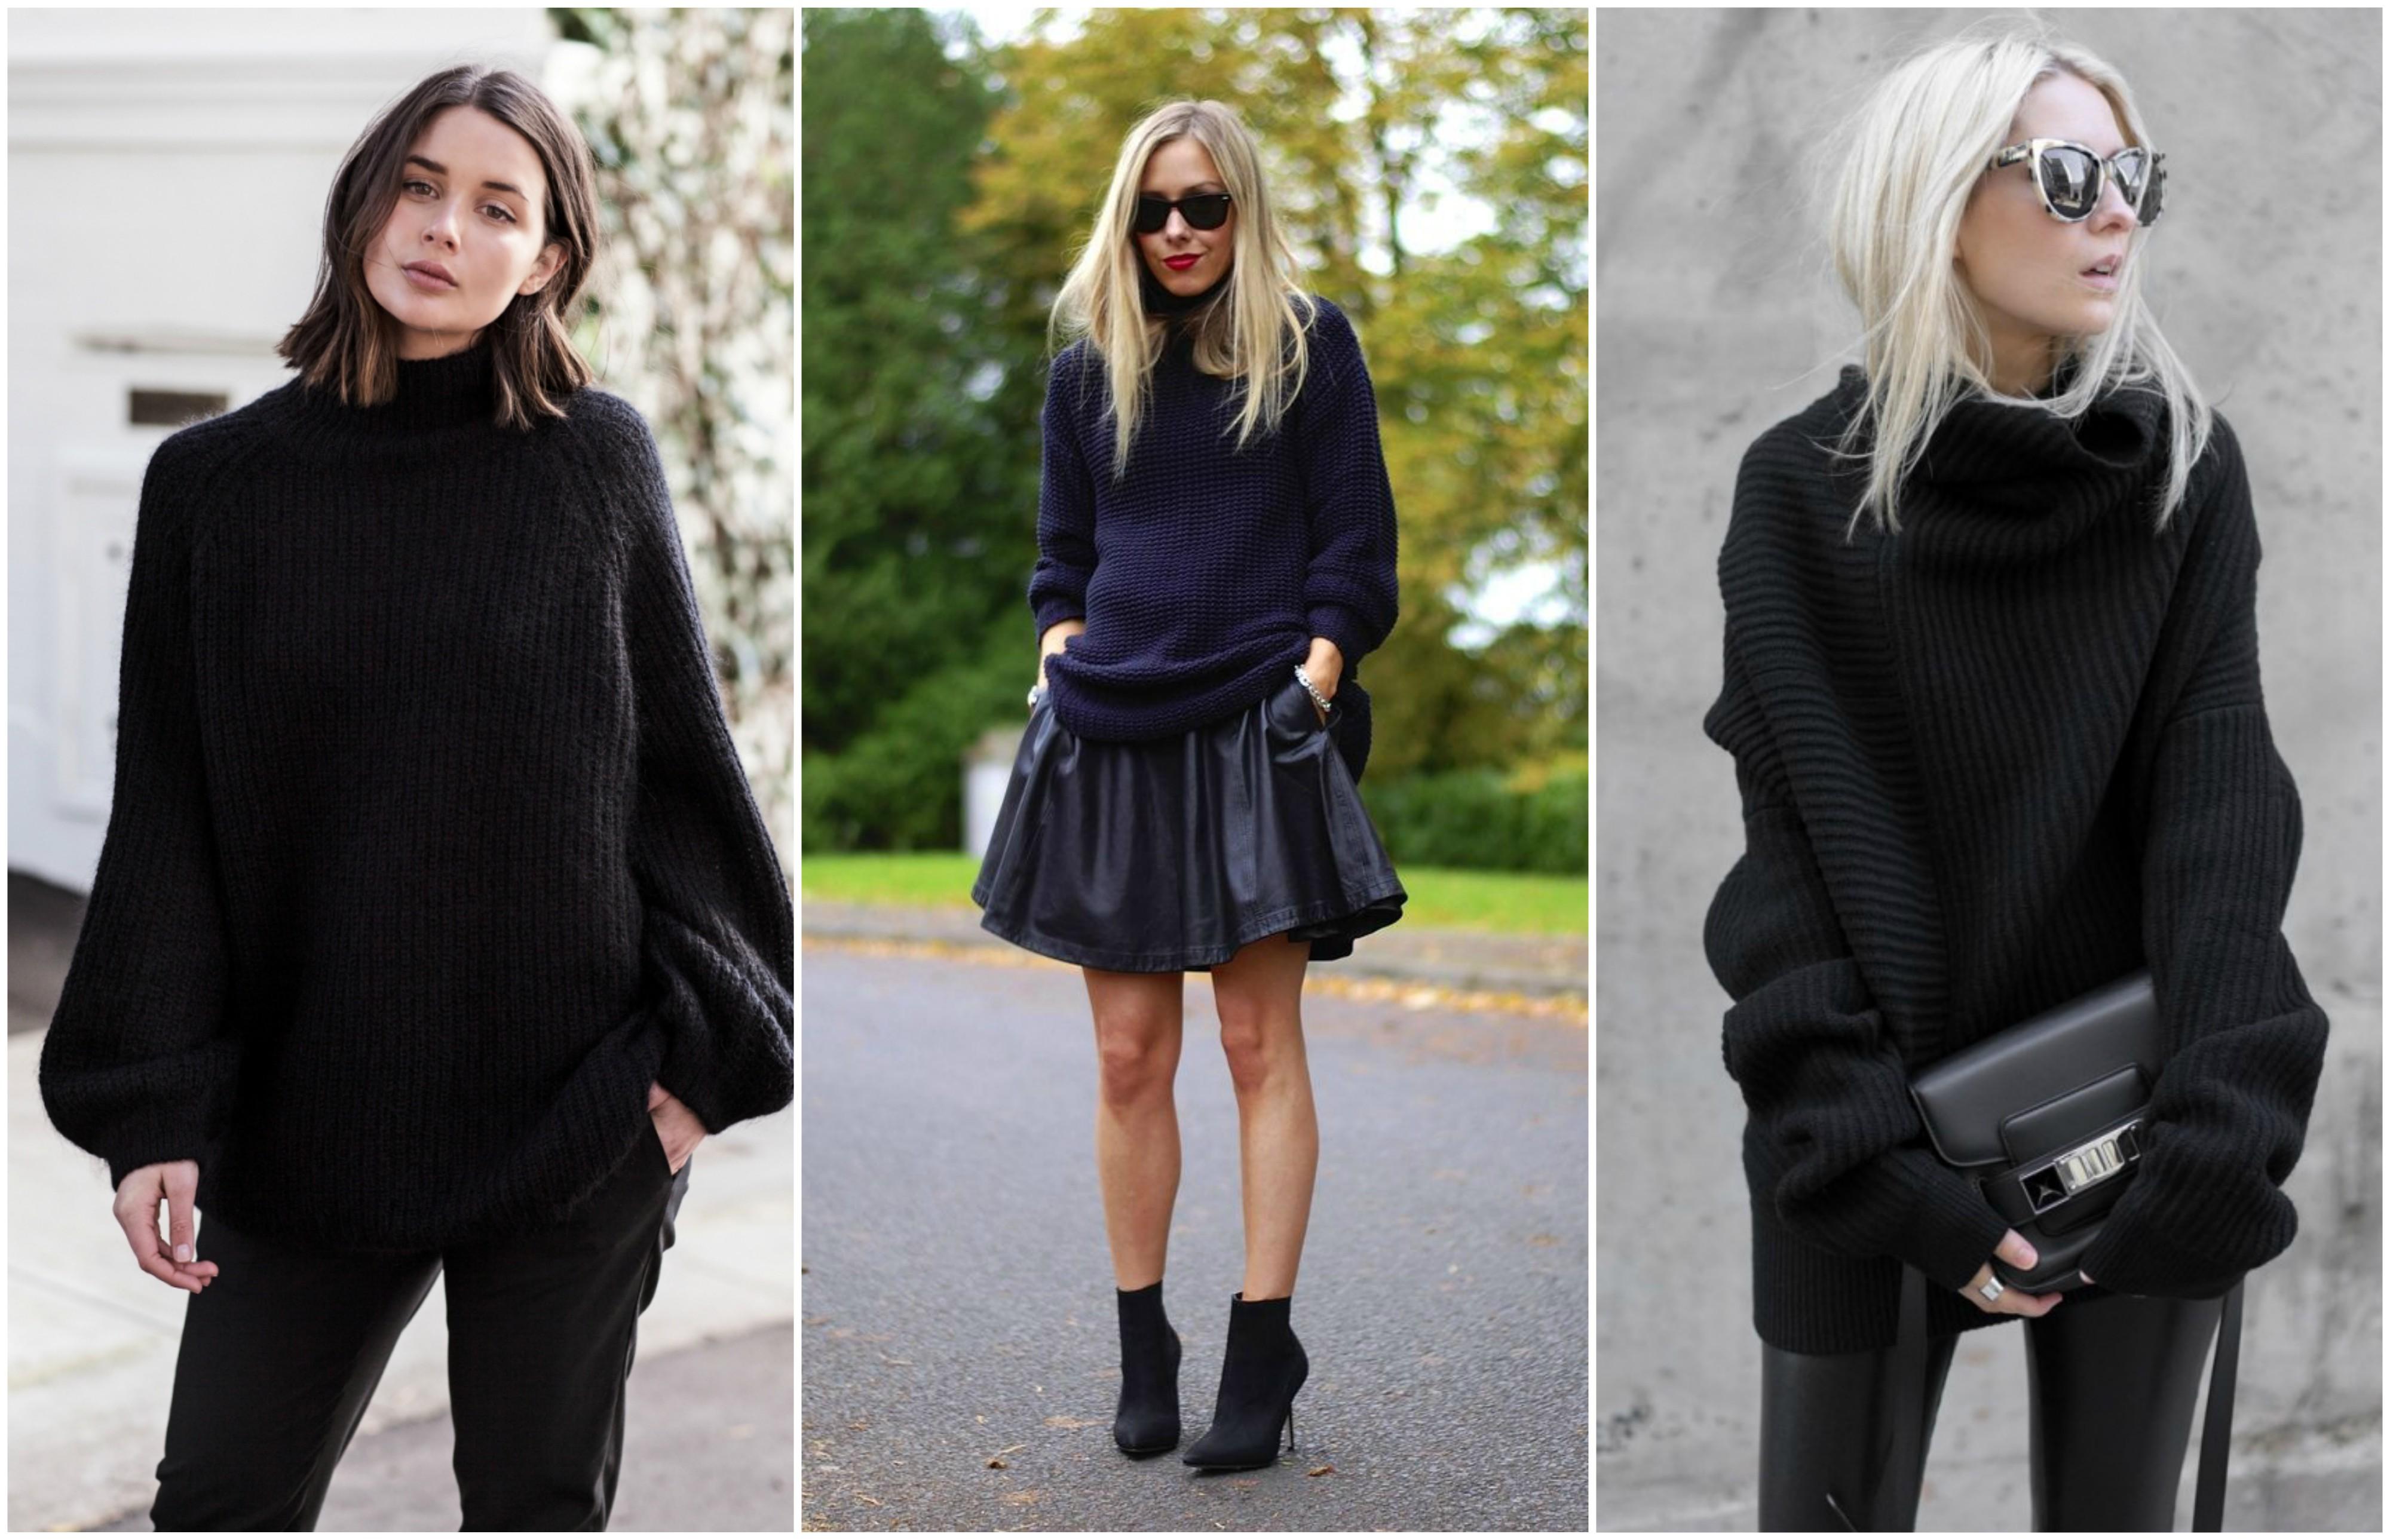 f6de3cfbd29b Ένα από τα αγαπημένα winter items είναι το oversized μαύρο πουλόβερ που  κάθε χρόνο γίνεται και πιο φαρδύ και πιο μακρύ. To αγαπάς